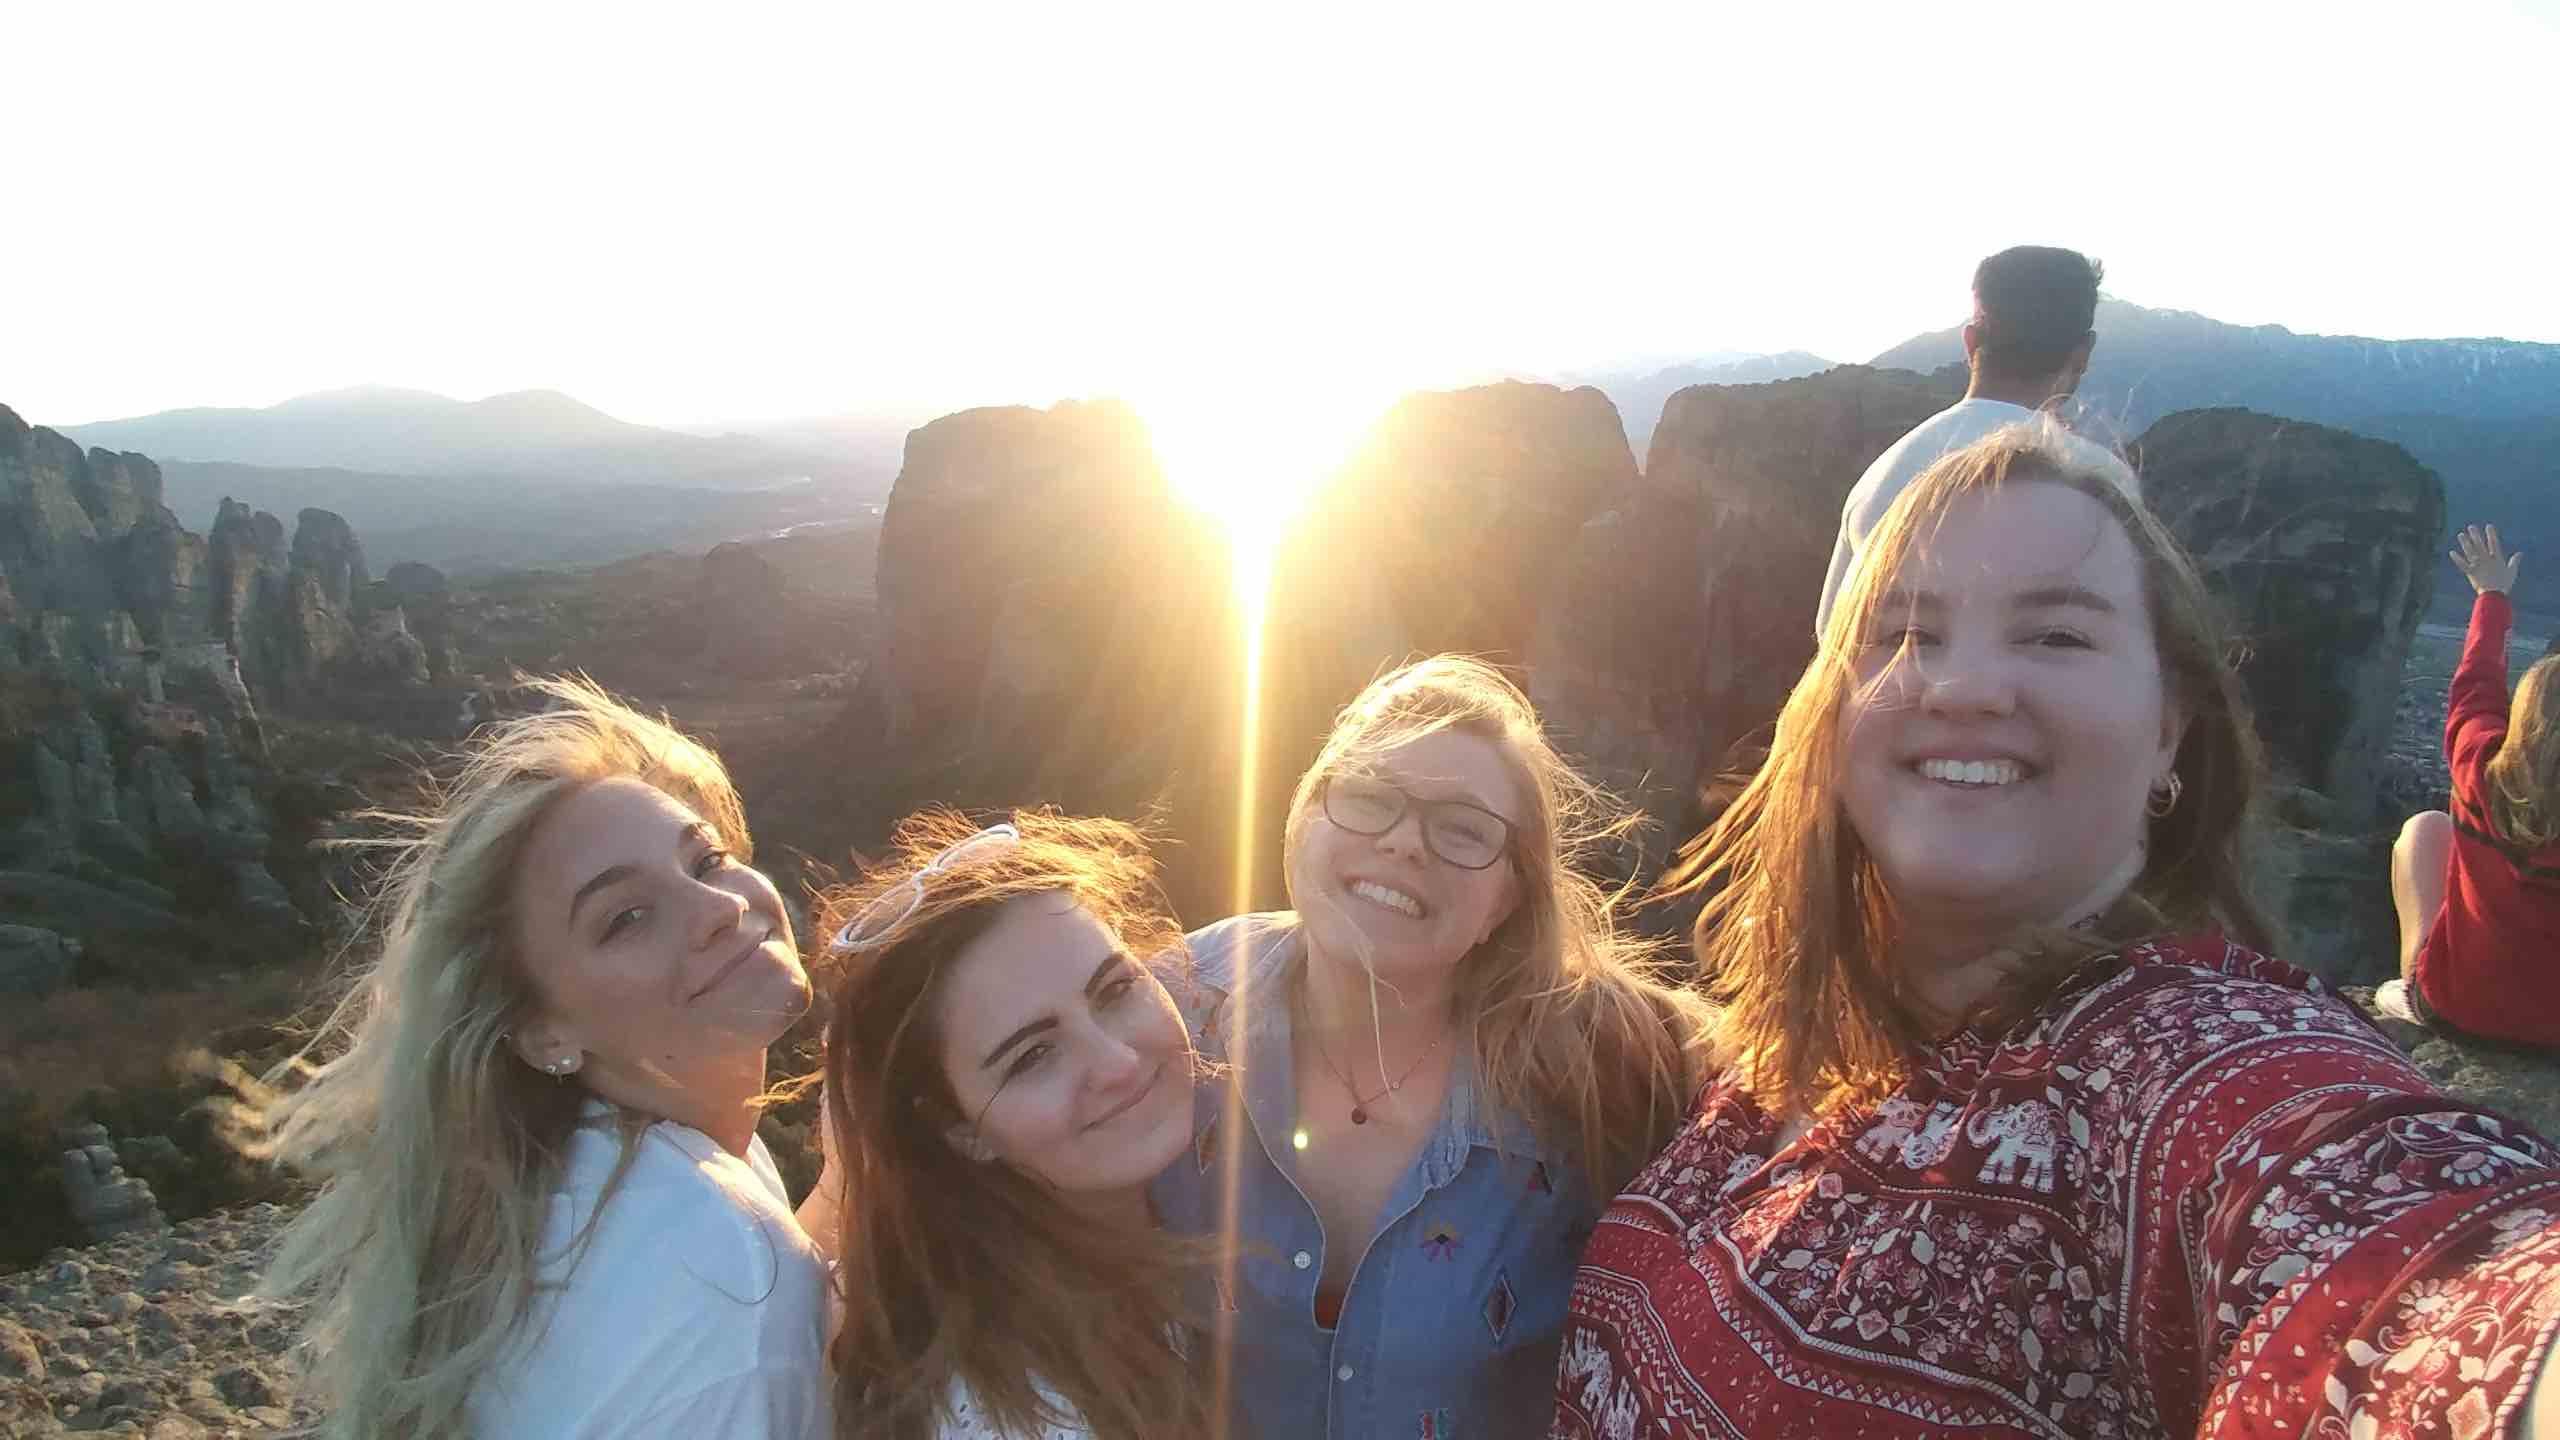 SP19_Semester in Greece - Hellenic American University_Alexis Ingebretsen_University of Wisconsin Milwaukee_Meteora and friends